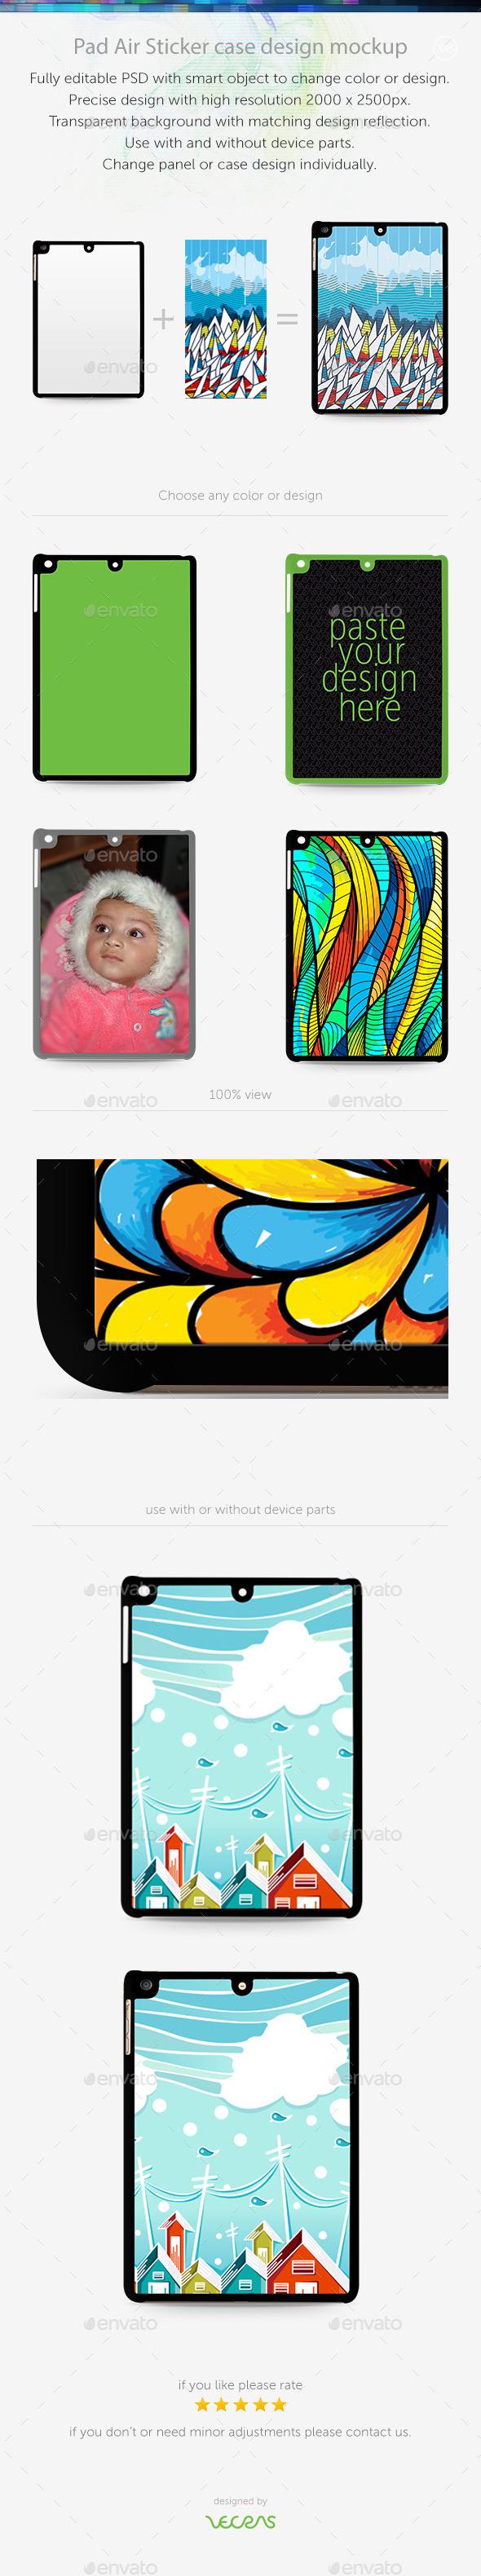 Pad Air Sticker Case Design Mockup - Mobile Displays